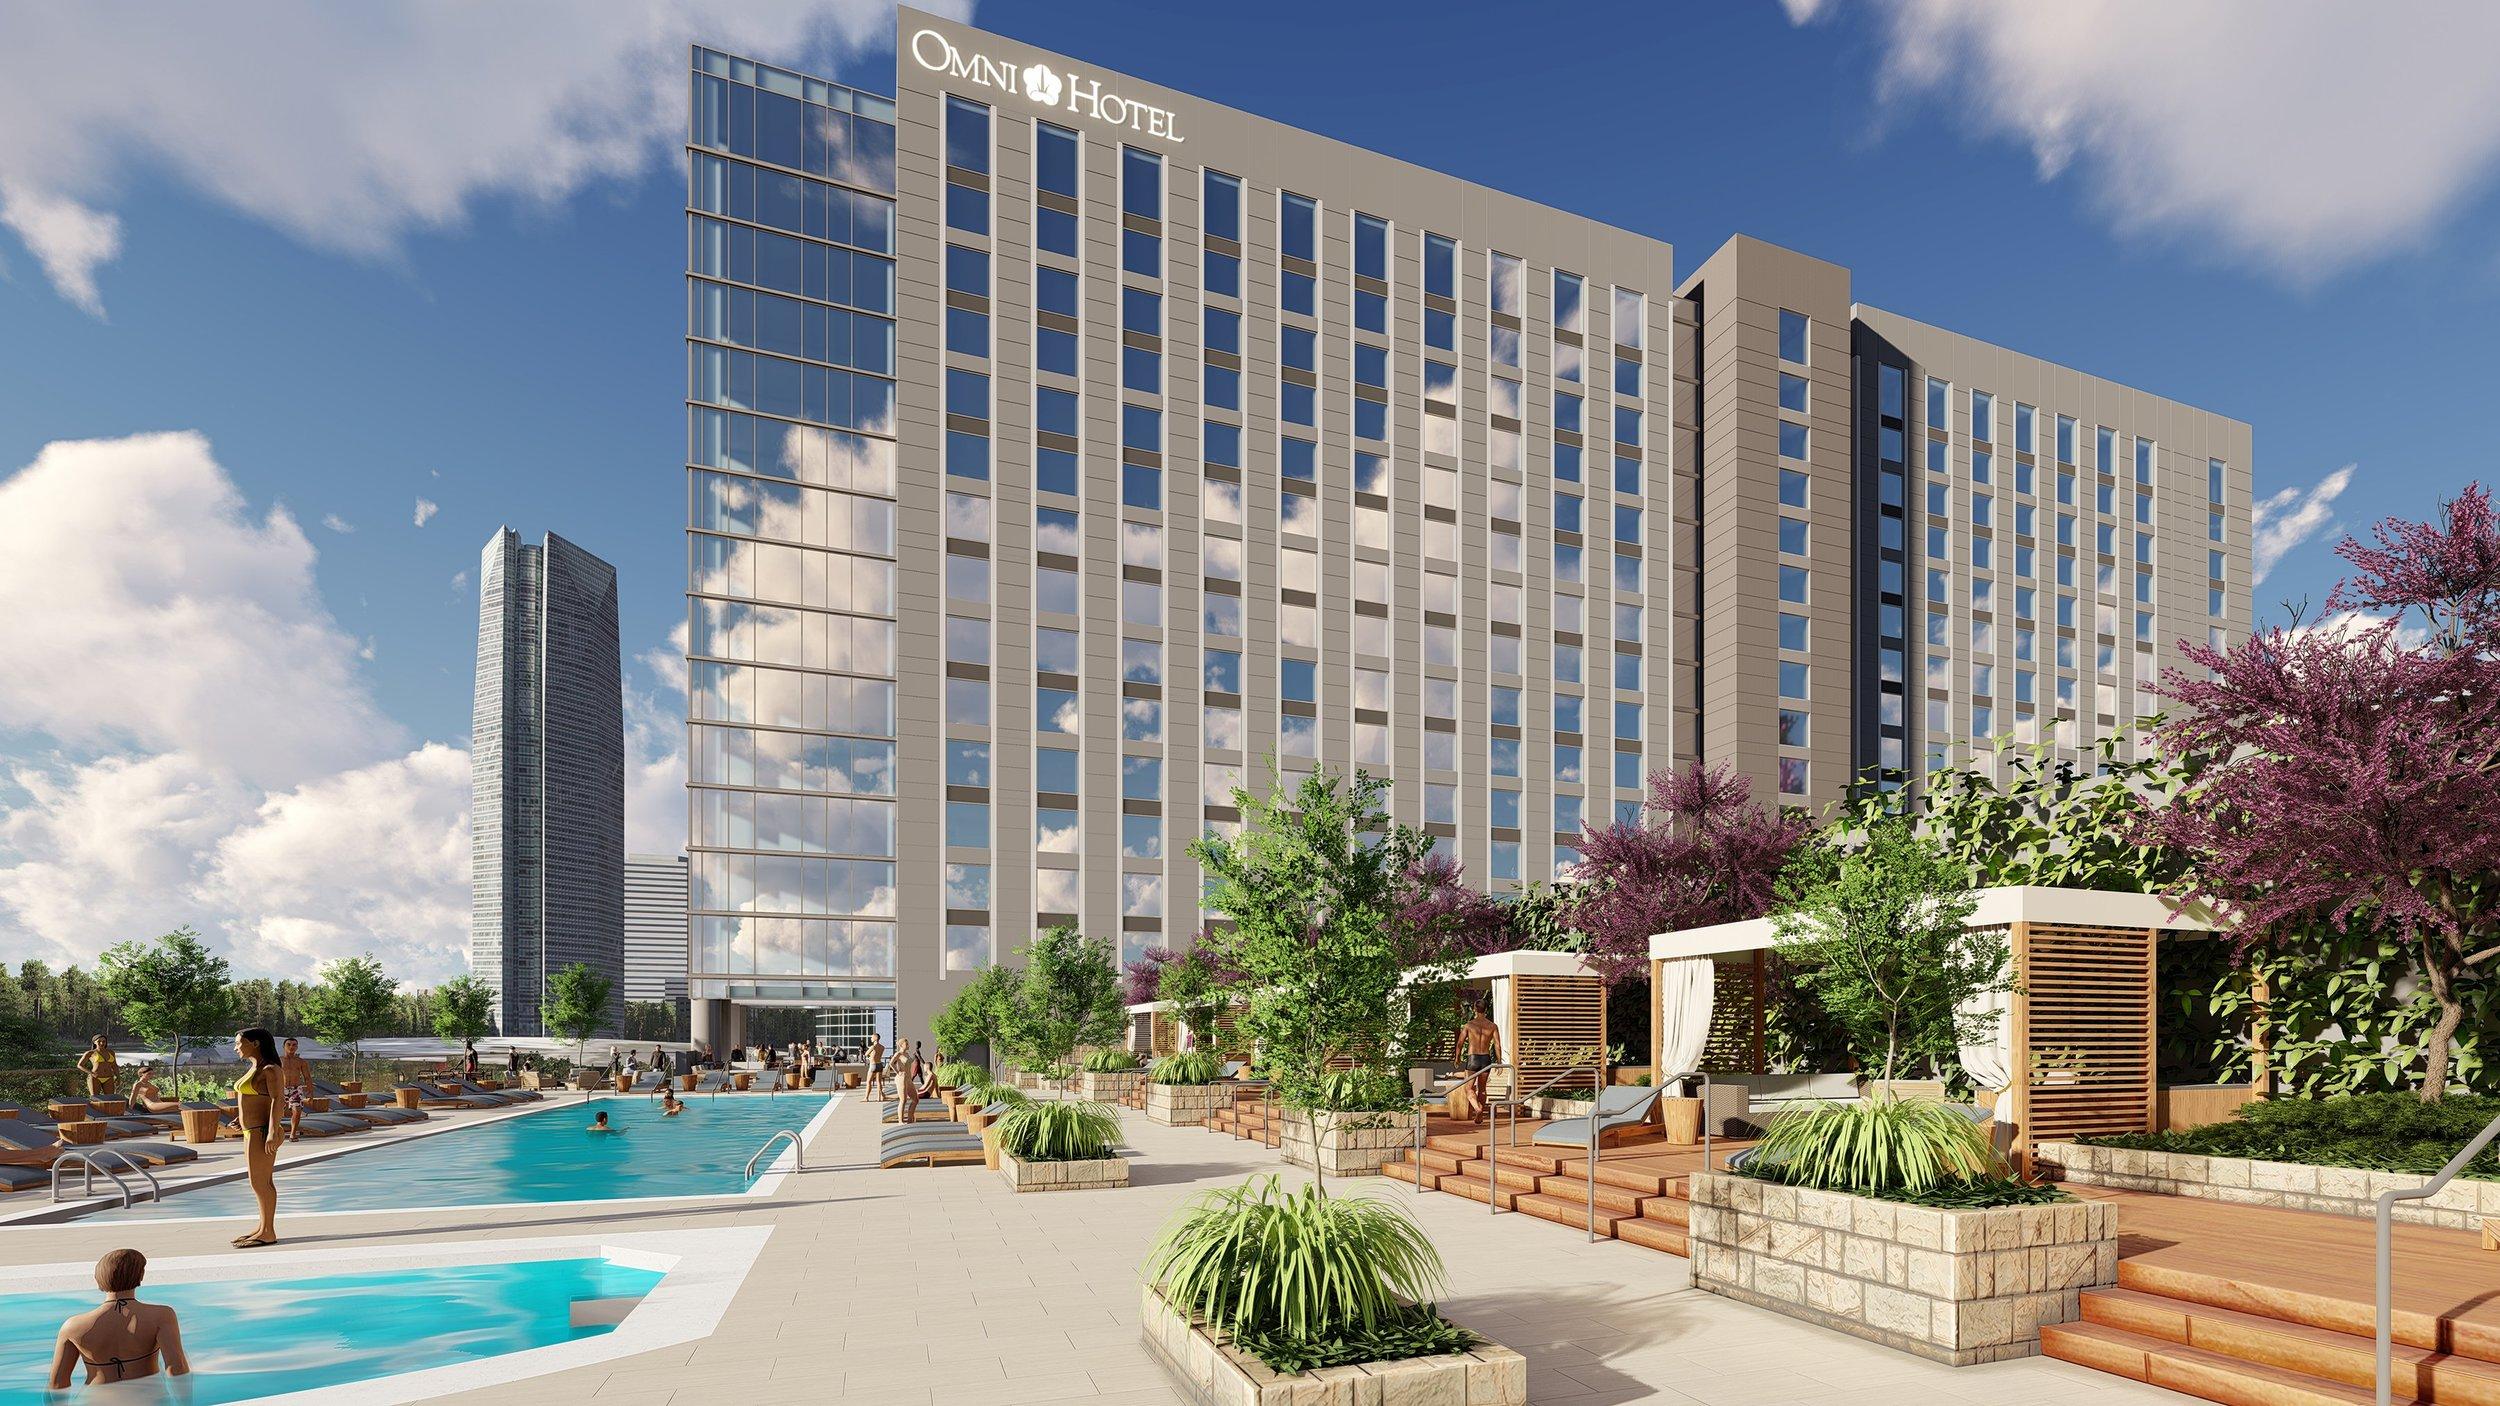 Omni Hotel ($150M)